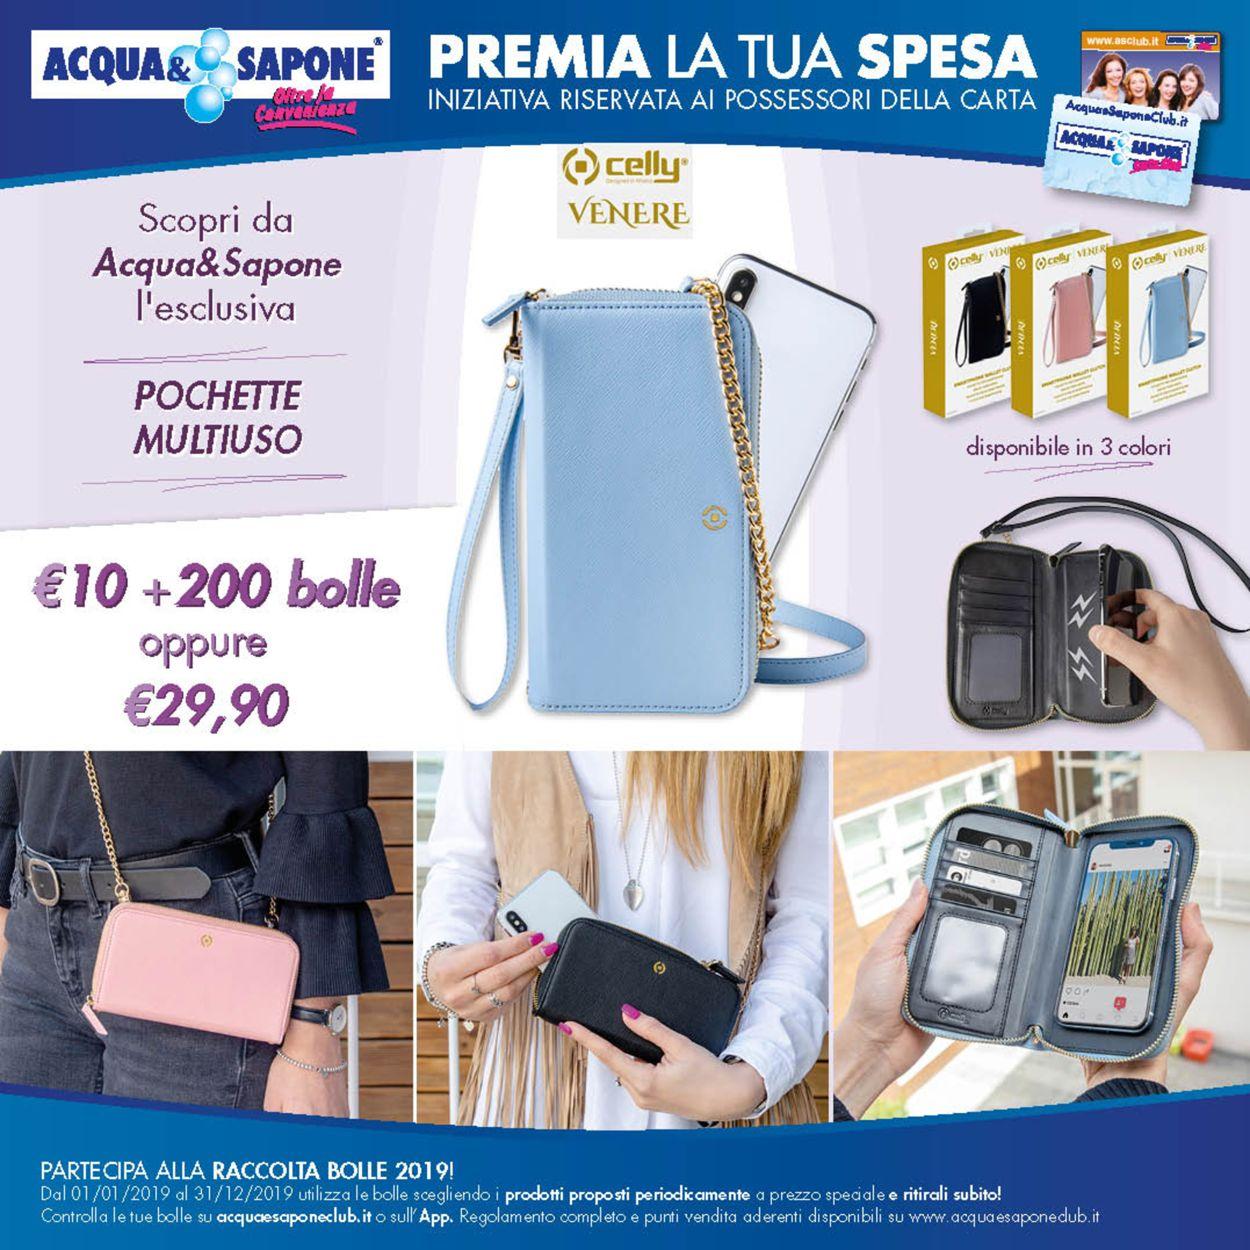 Volantino Acqua & Sapone - Offerte 10/12-31/12/2019